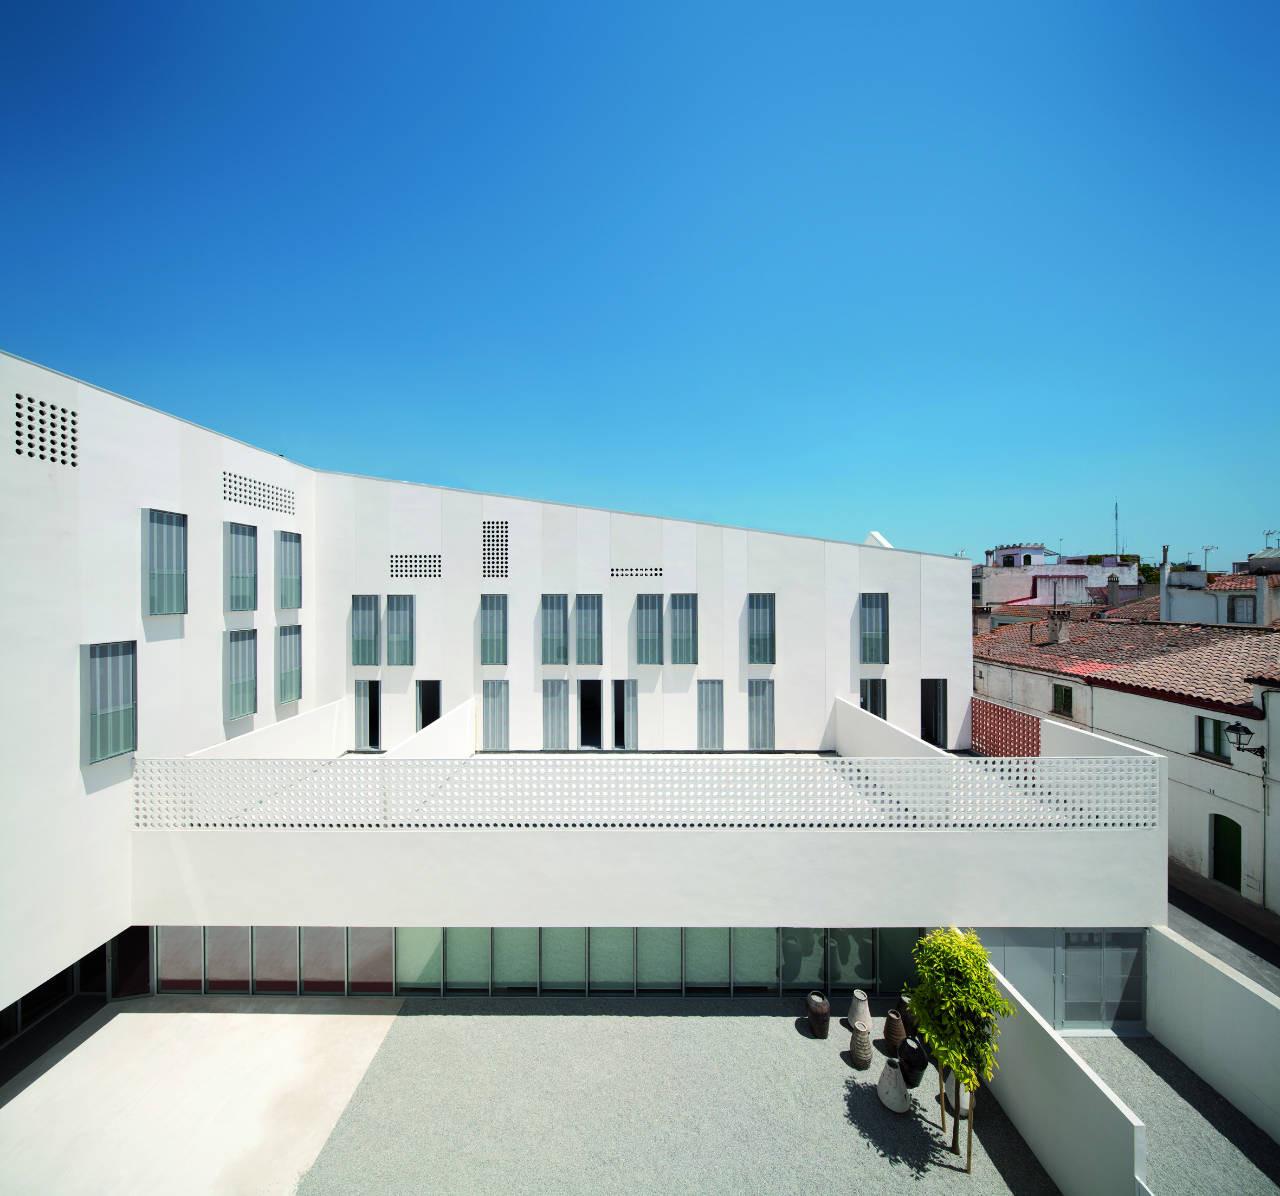 14 Social Housing Units In Barcelona / Batlle & Roig Architects, © A. Flajszer